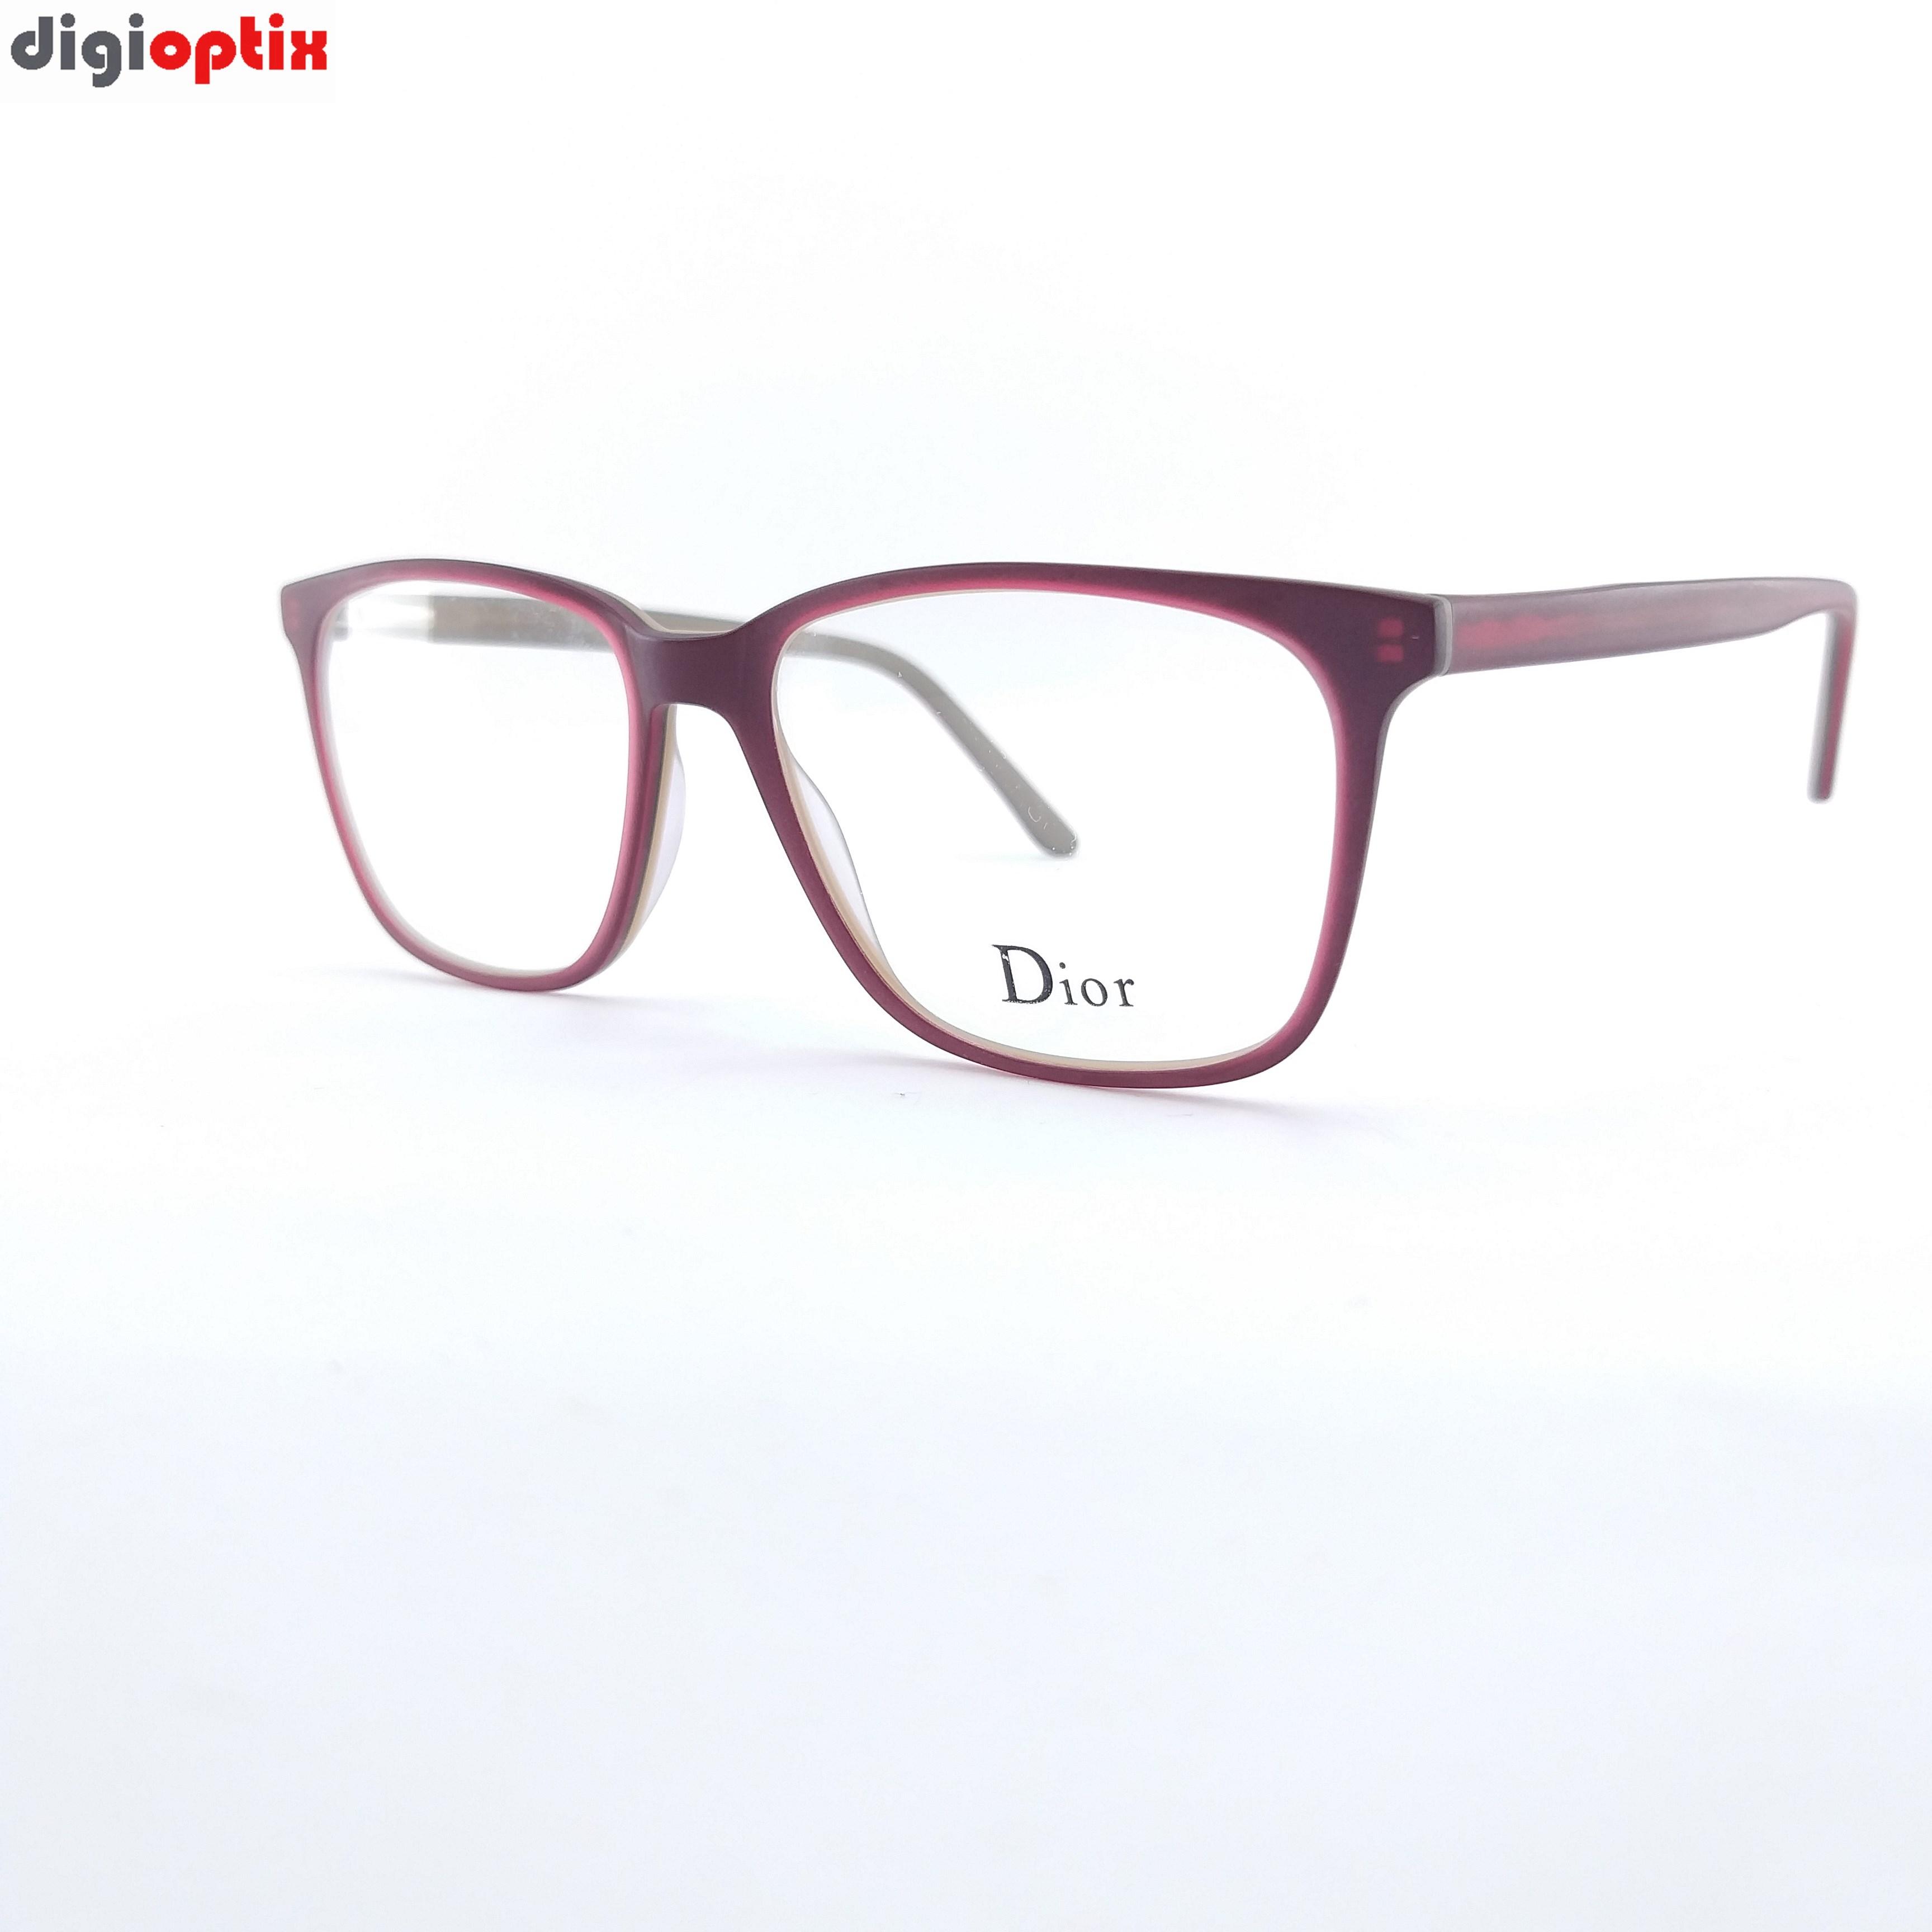 فریم عینک طبی کائوچویی مارک Dior رنگ جگری مدل F1766